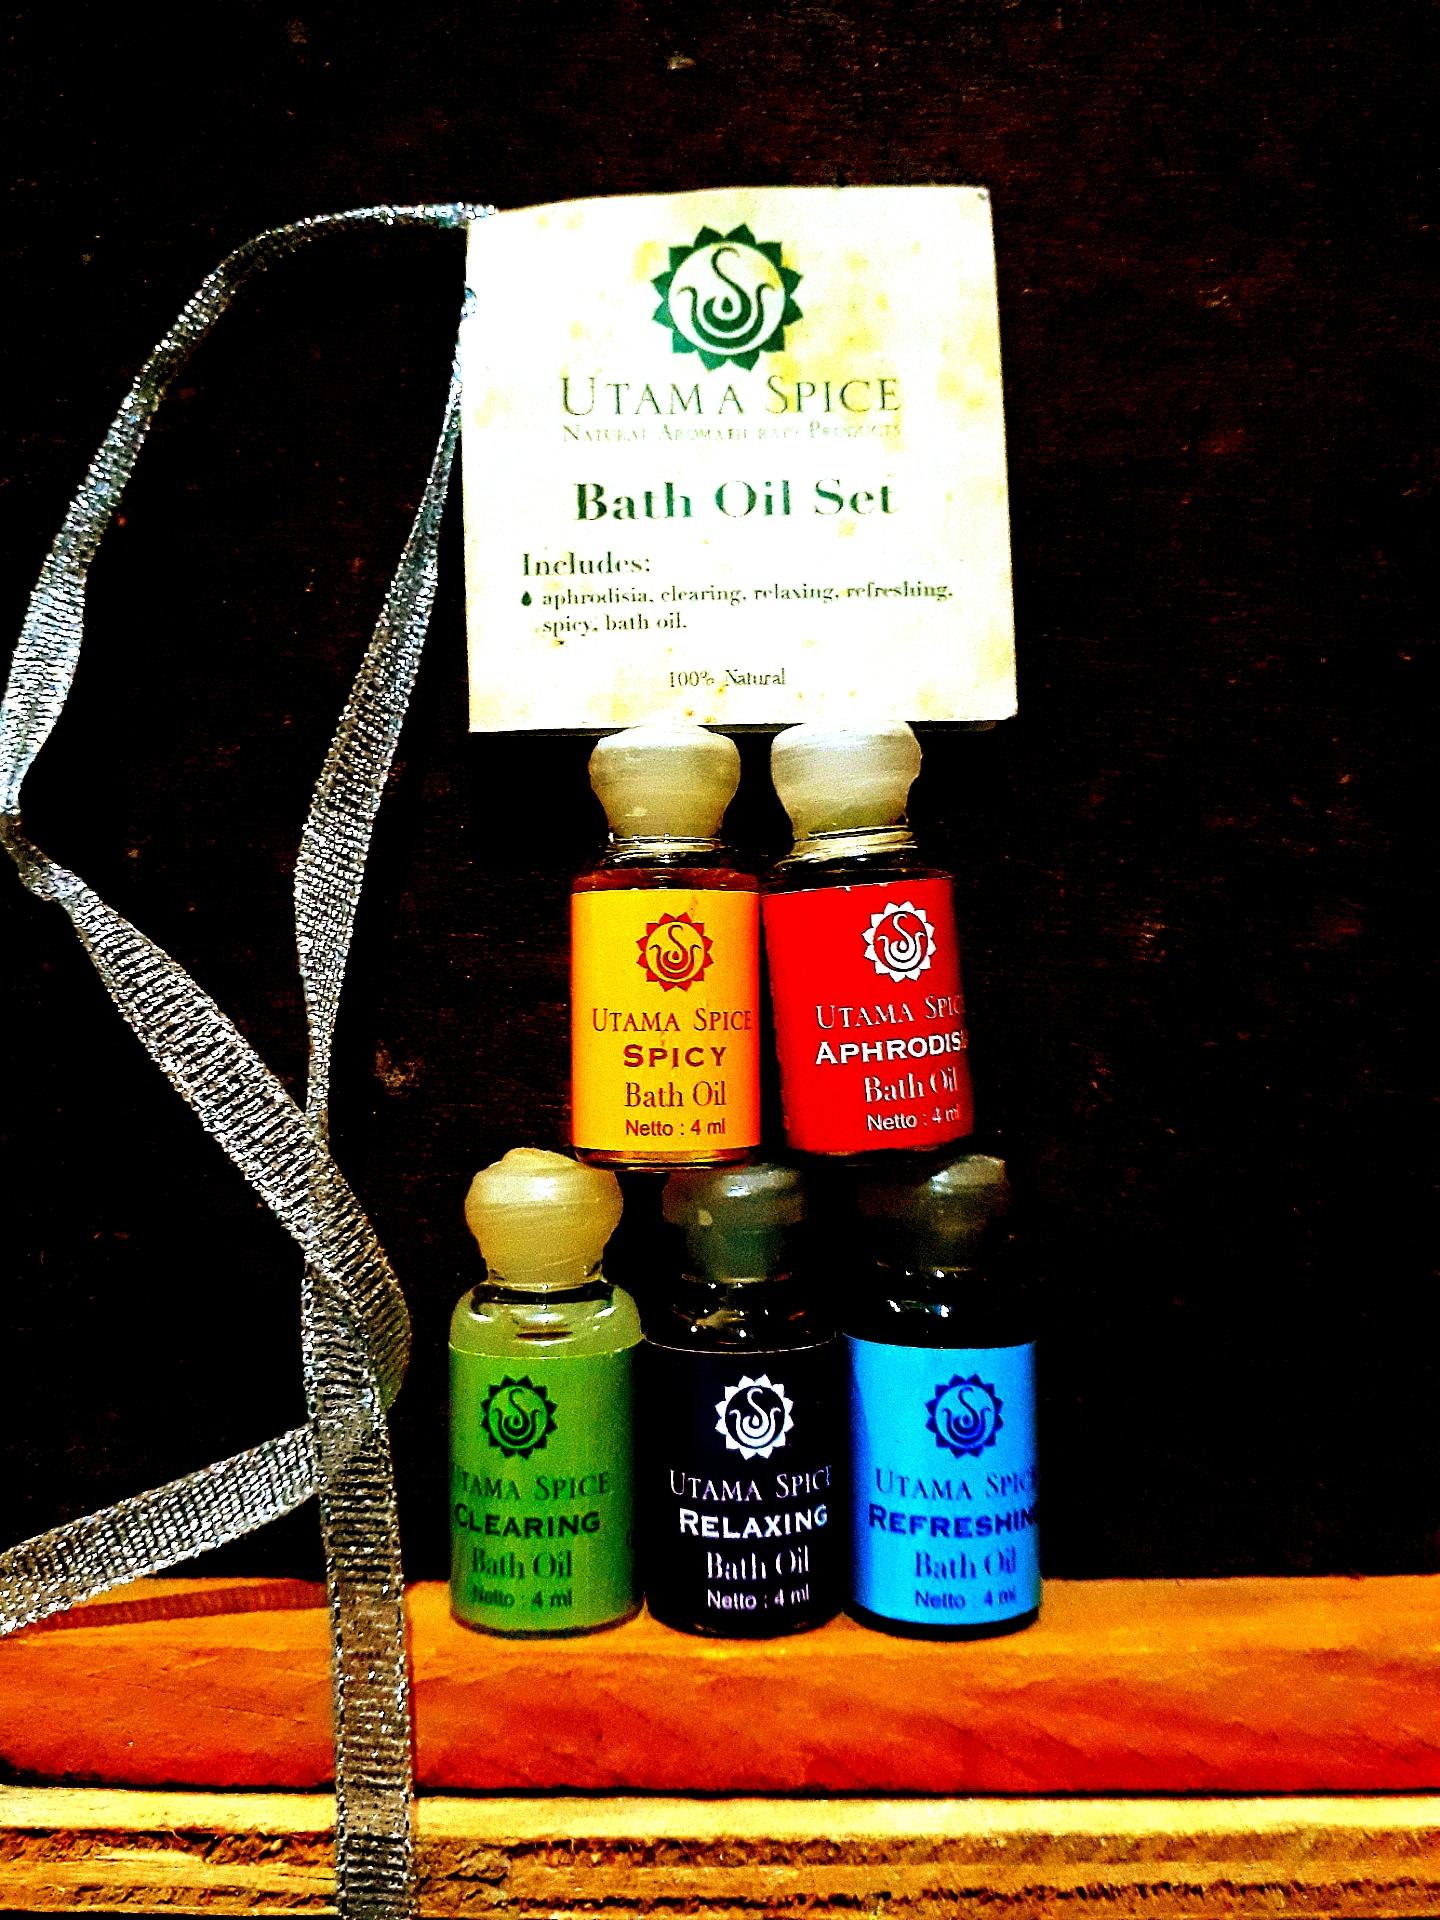 Utama Spice Bath Oil Set